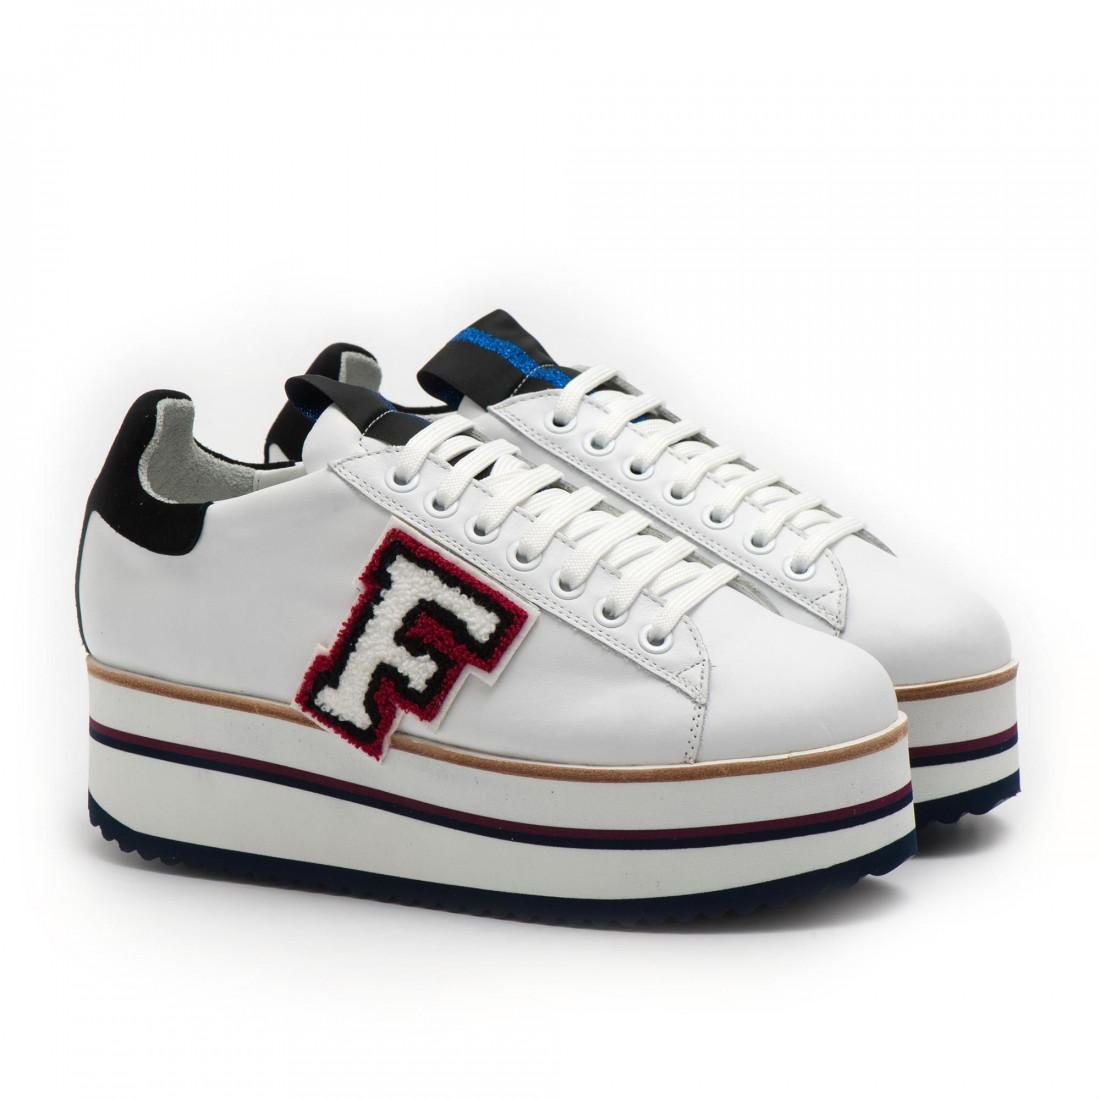 sneakers woman fabi fd5840c00spanapb08 3520